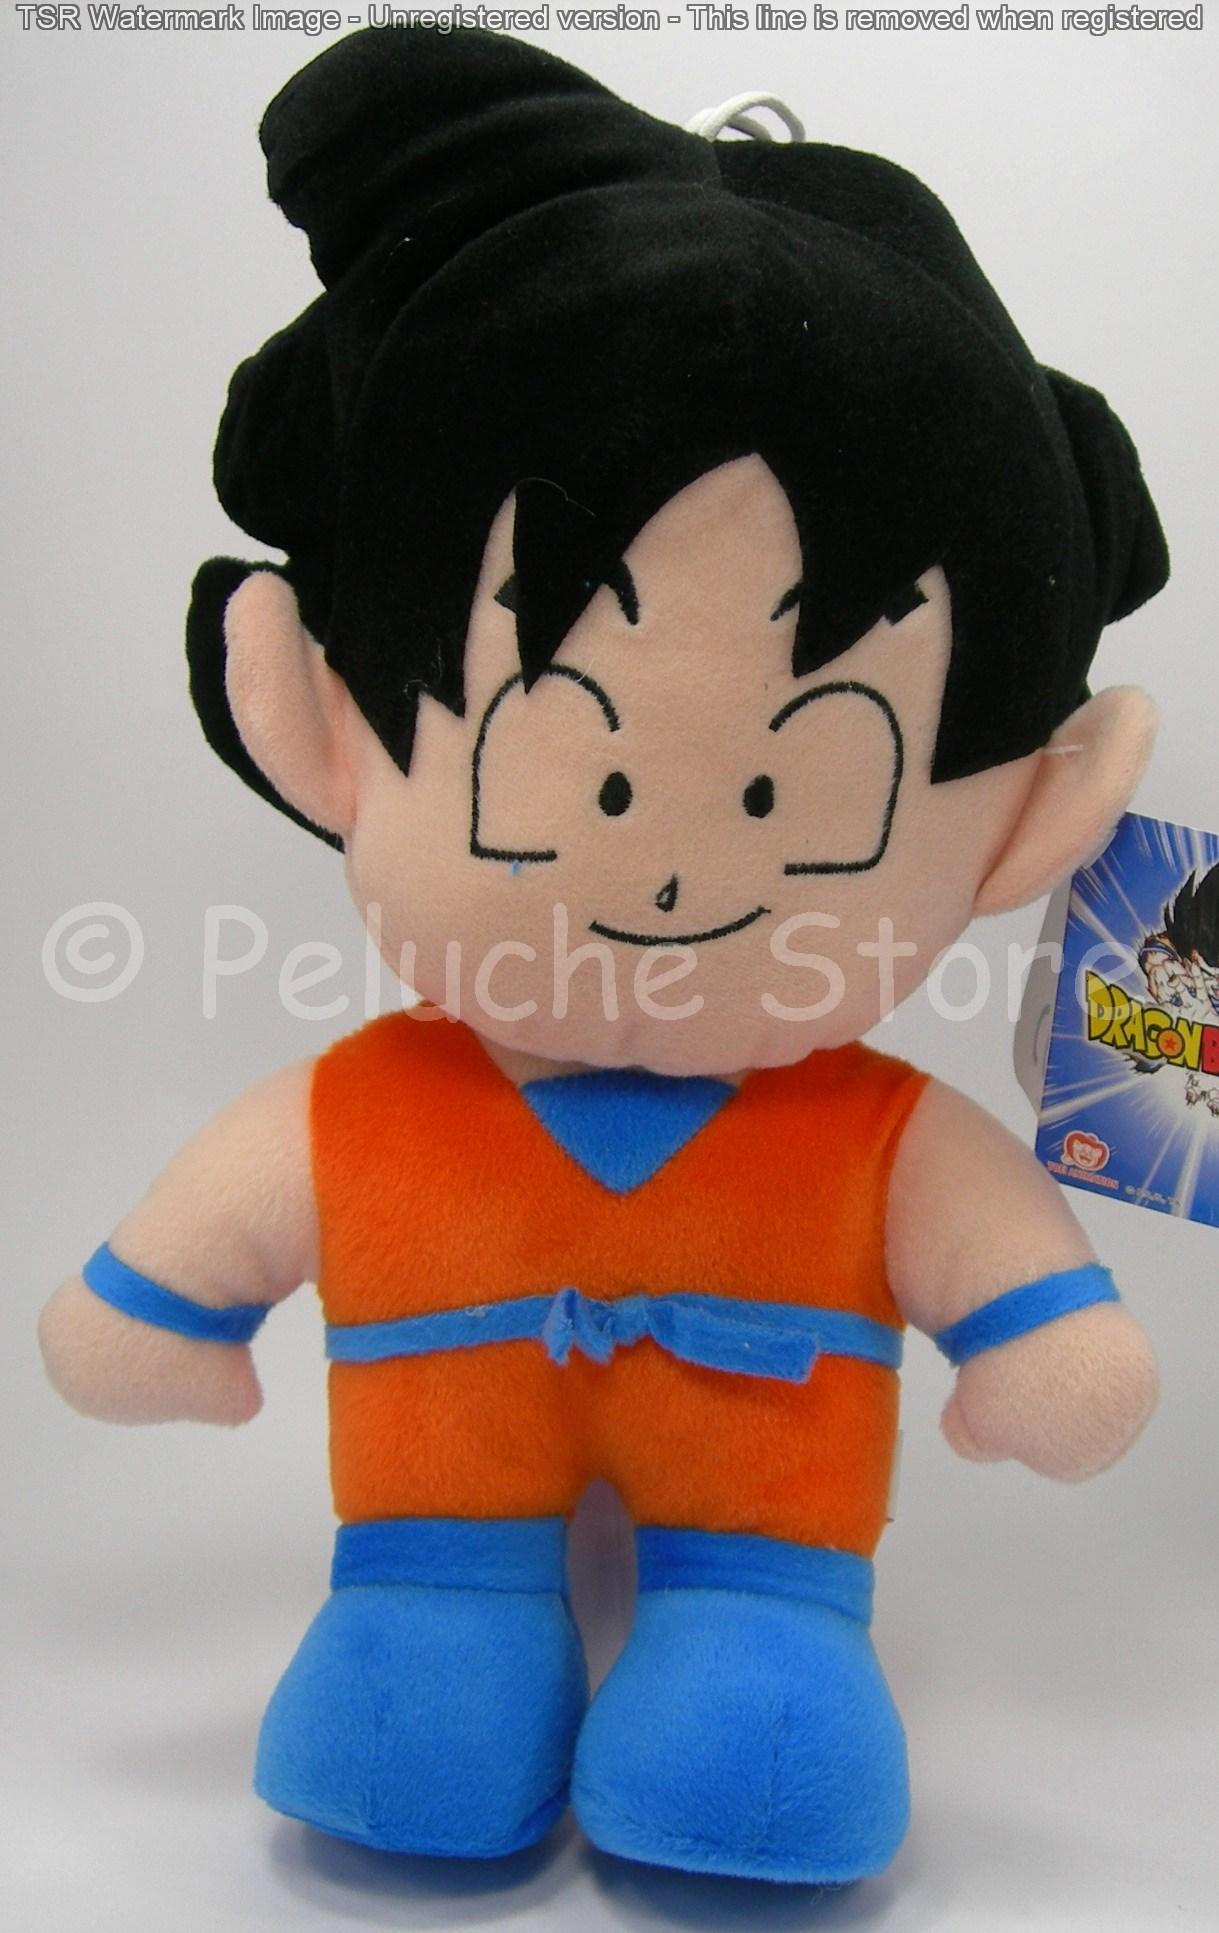 Dragon Ball Z peluche 30 cm Goku Vegeta Krillin Bulma Piccolo Originale